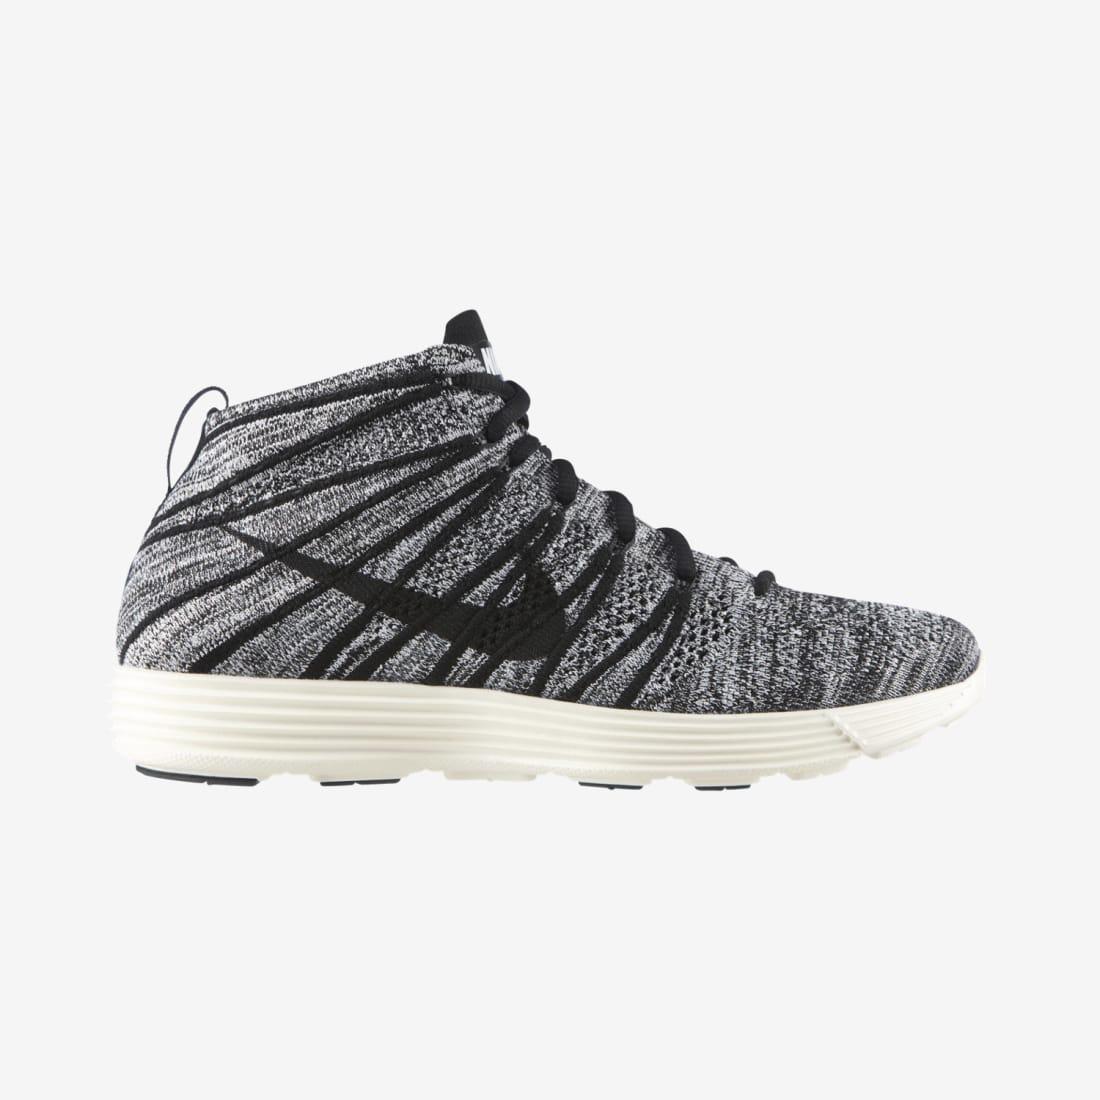 321b5bdfe4b8 Nike · Nike Sportswear. Nike Lunar Flyknit Chukka